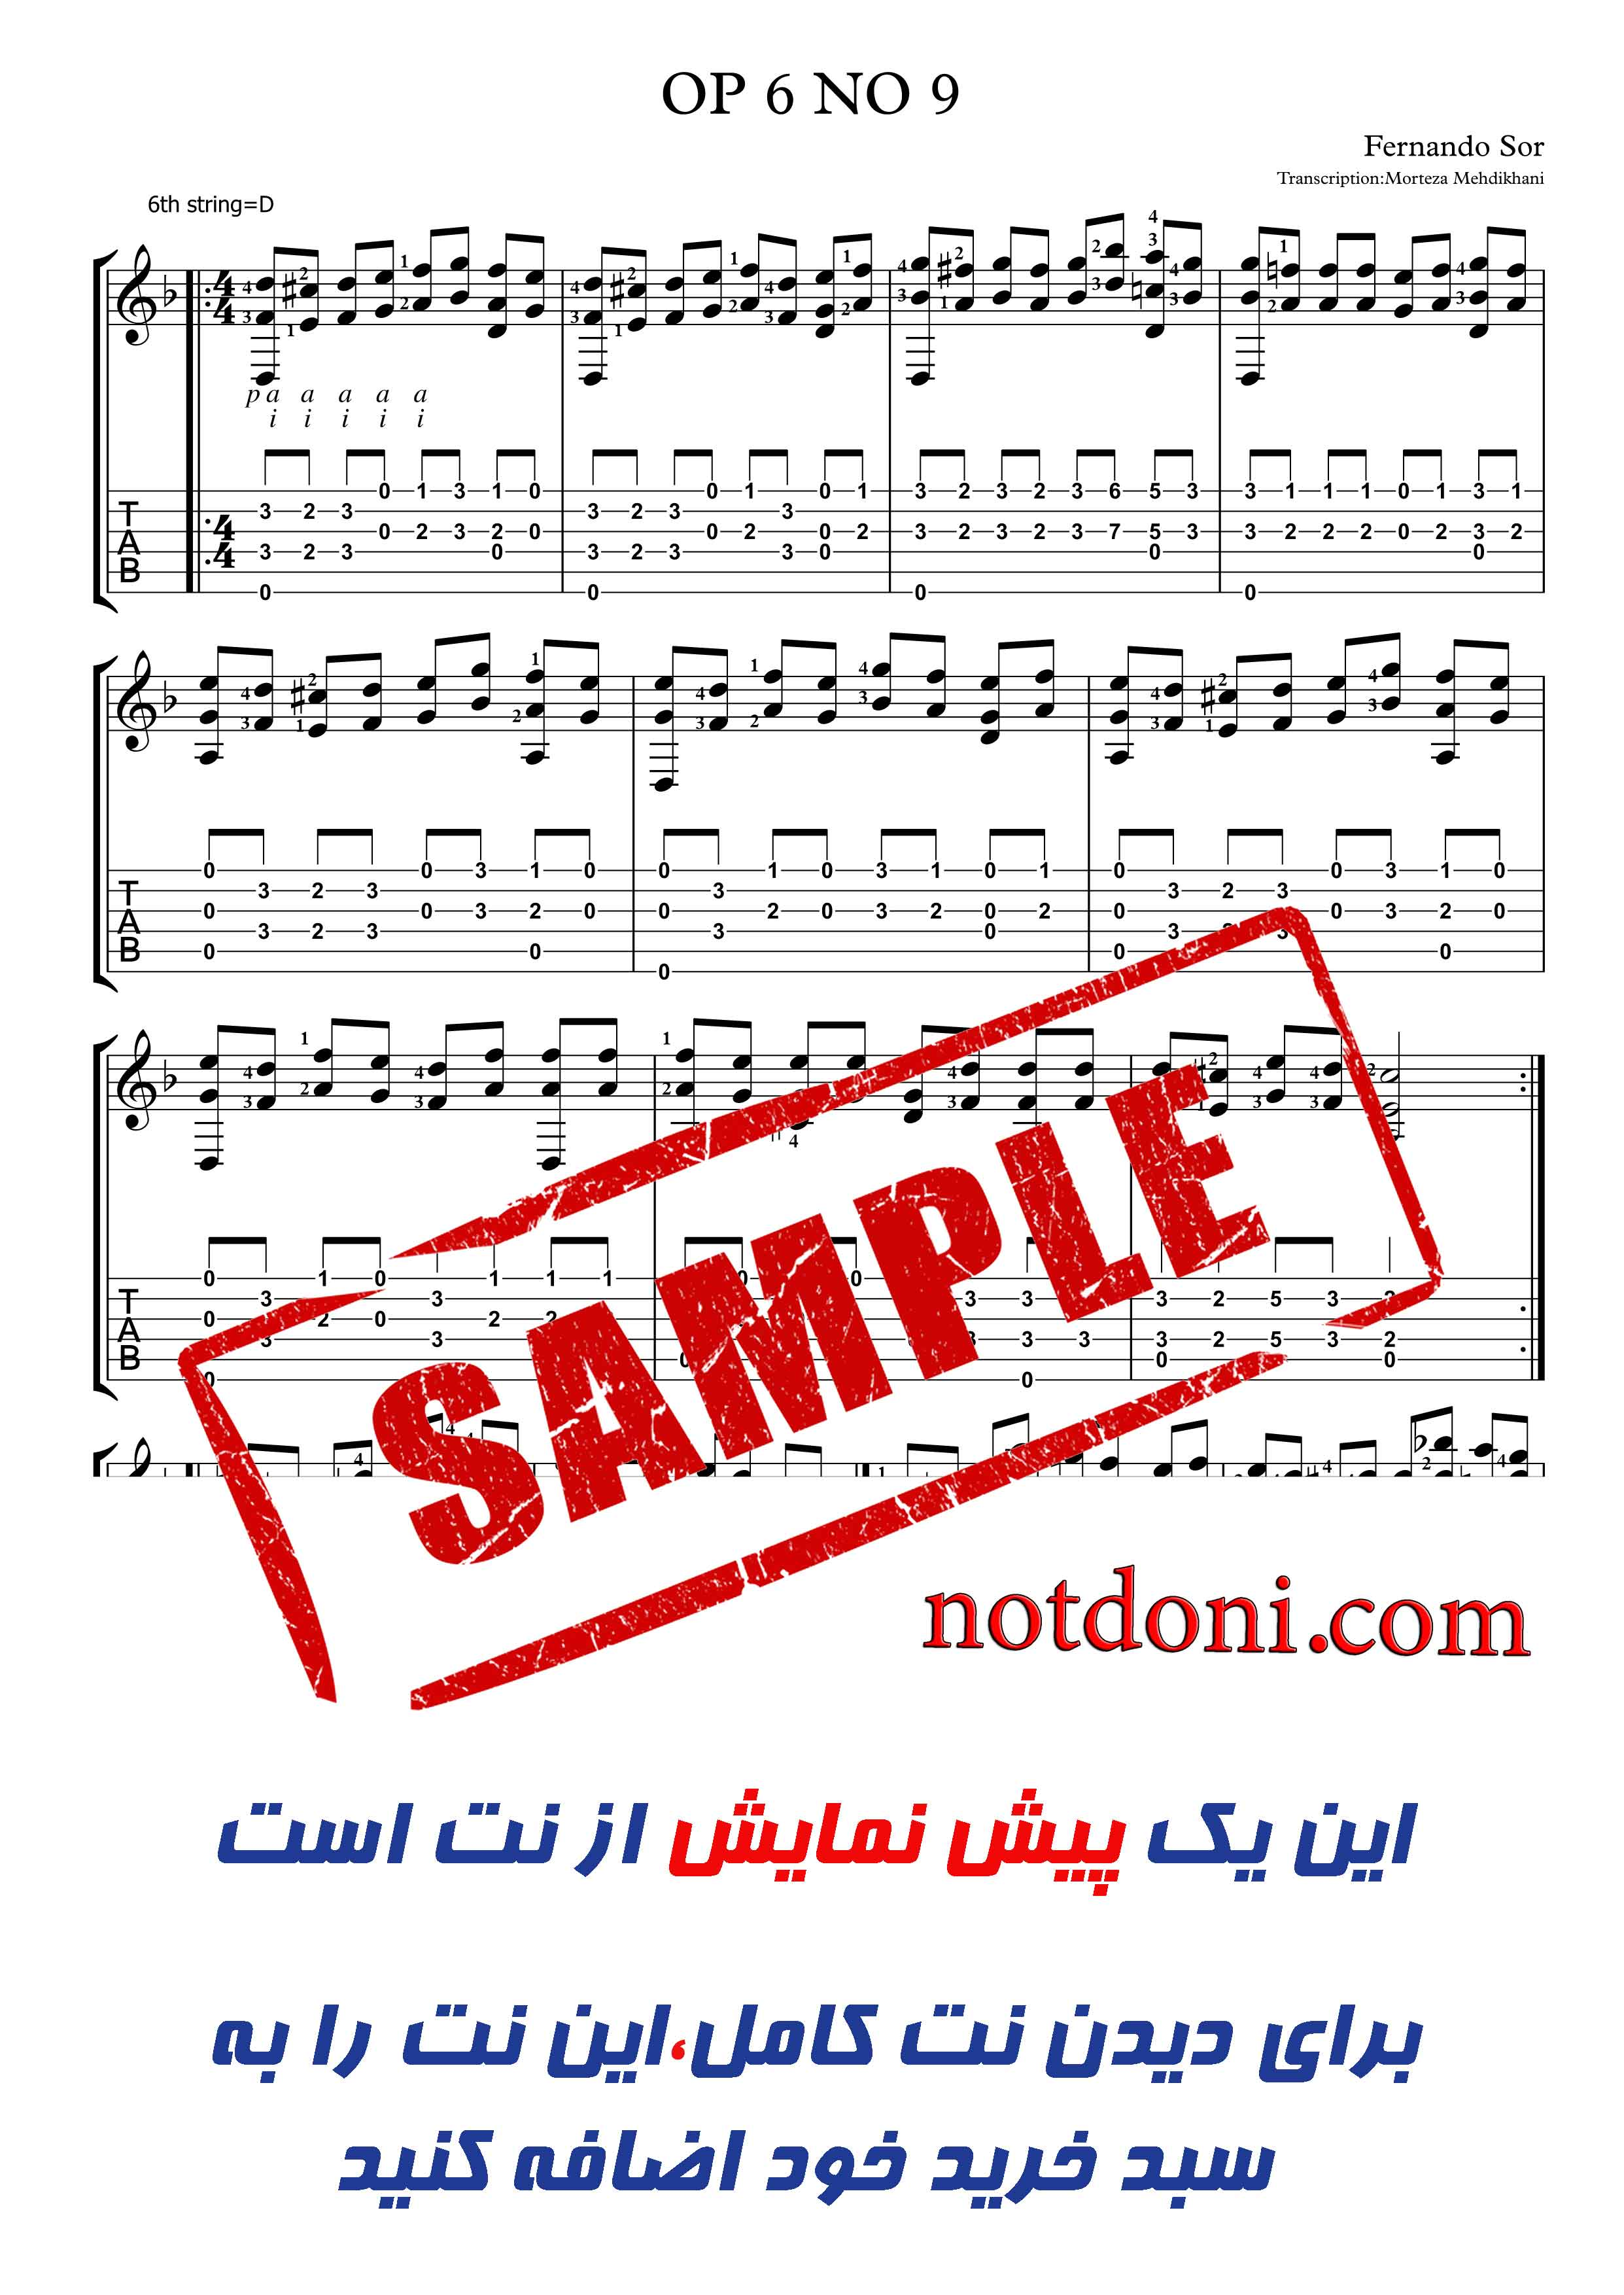 930e7264-5771-4b8a-b9f5-daad1695902c_نت-آهنگ.jpg